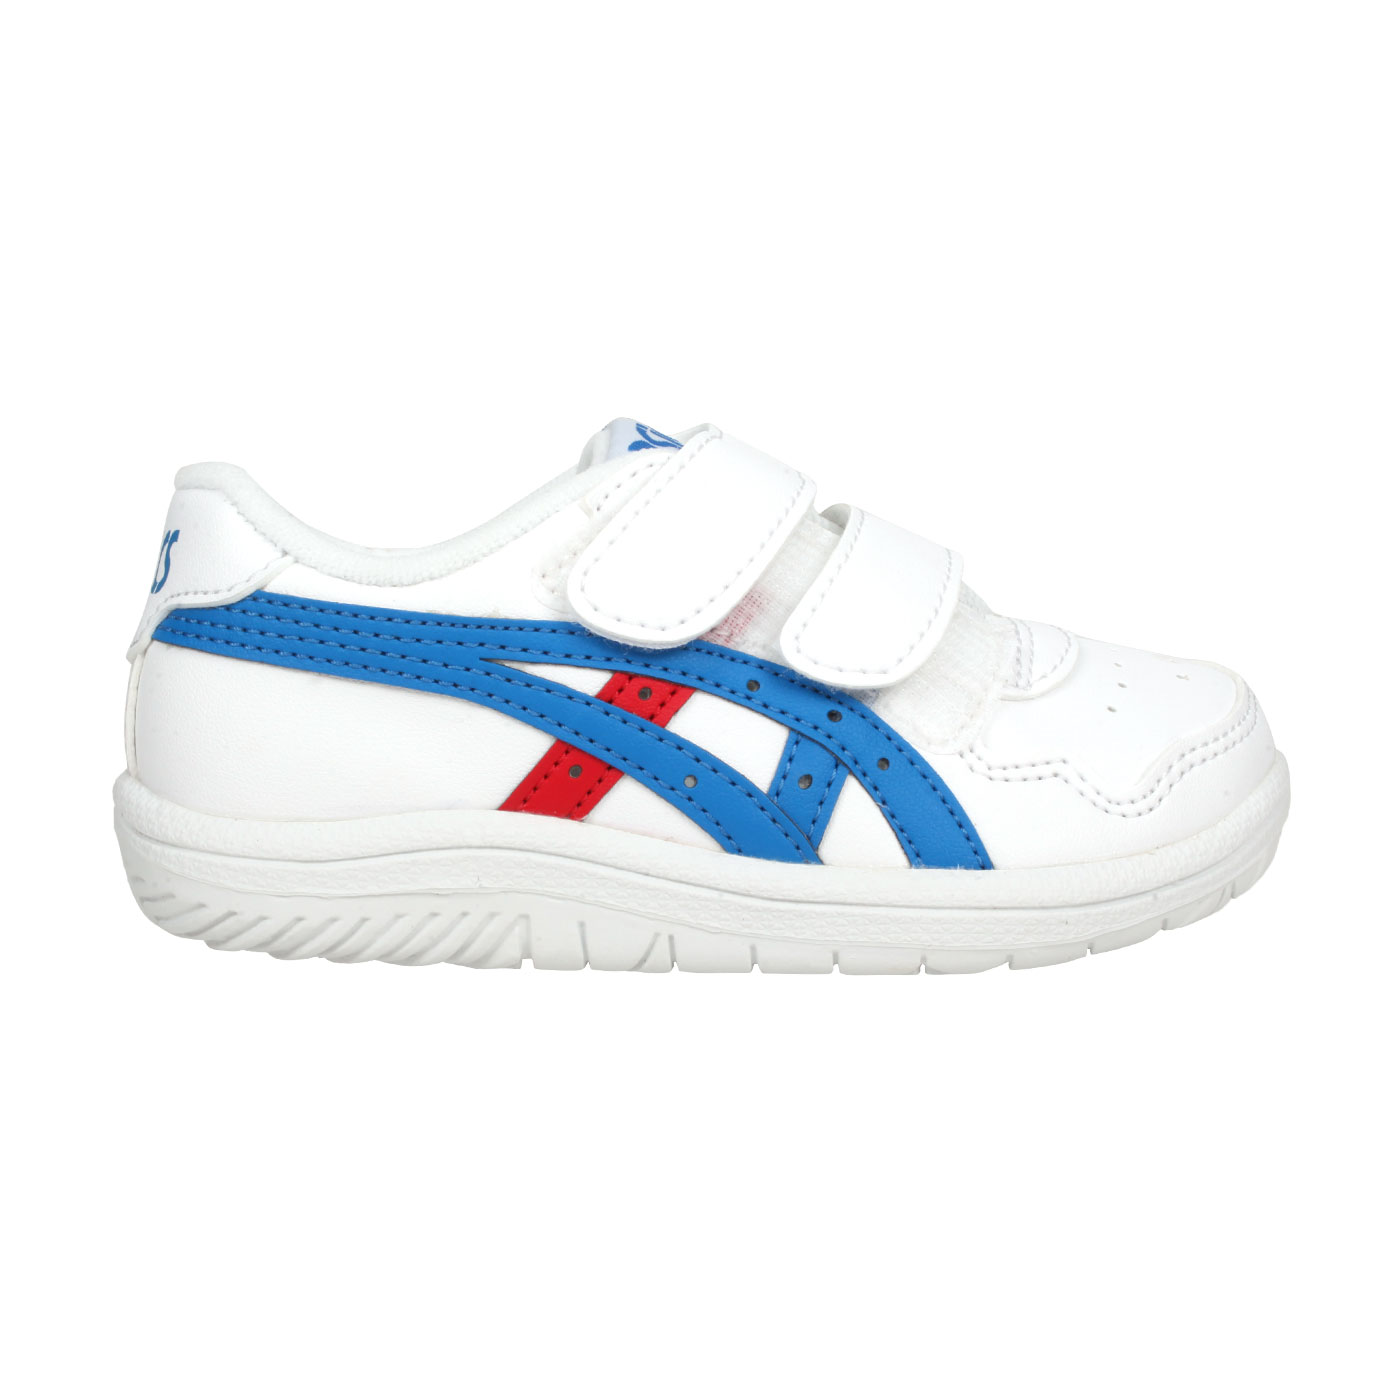 ASICS 小童休閒運動鞋  @JAPAN S TS@1194A082-139 - 白藍紅